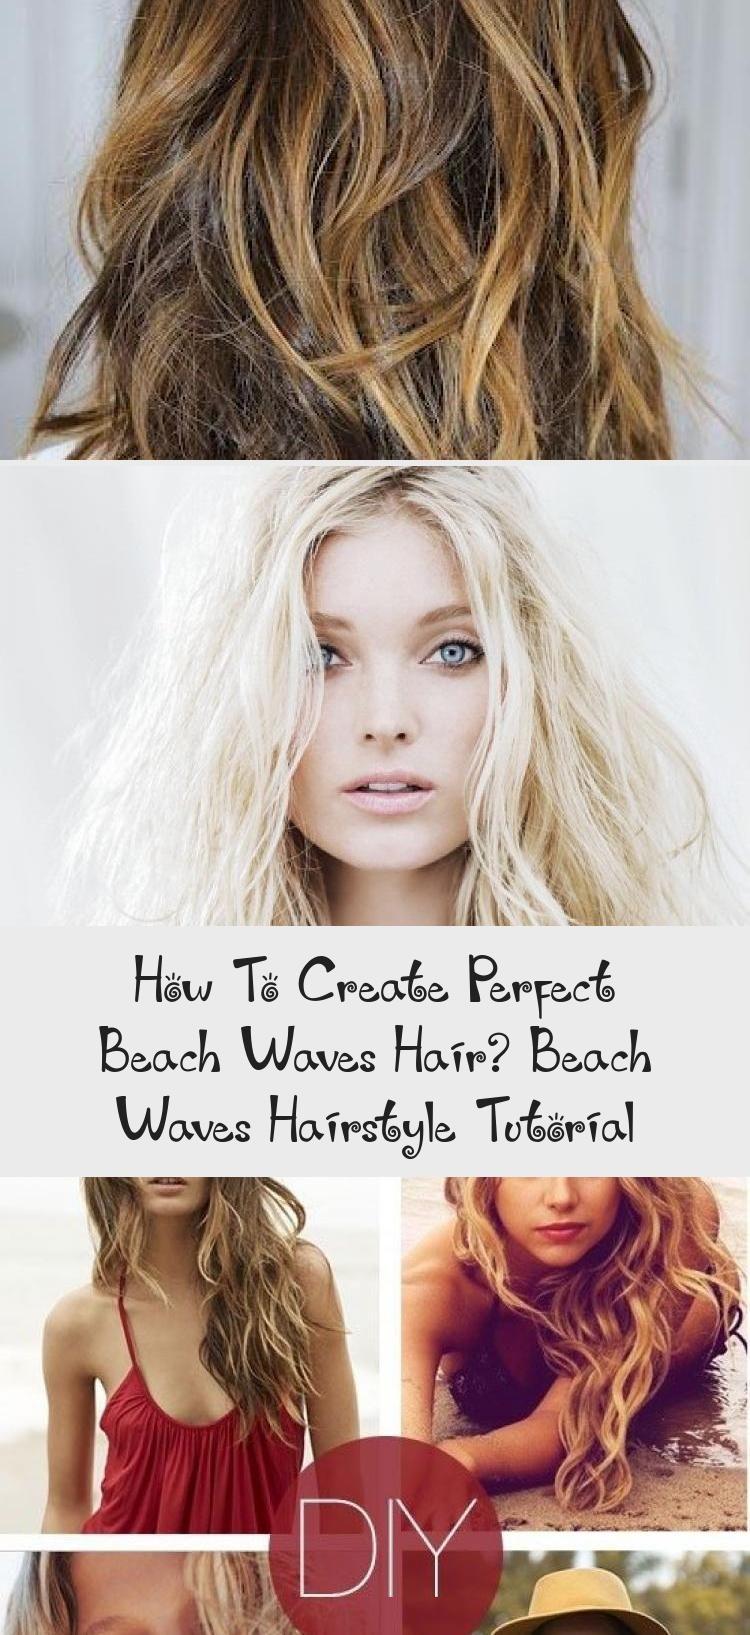 How To Create Perfect Beach Waves Hair Beach Waves Hairstyle